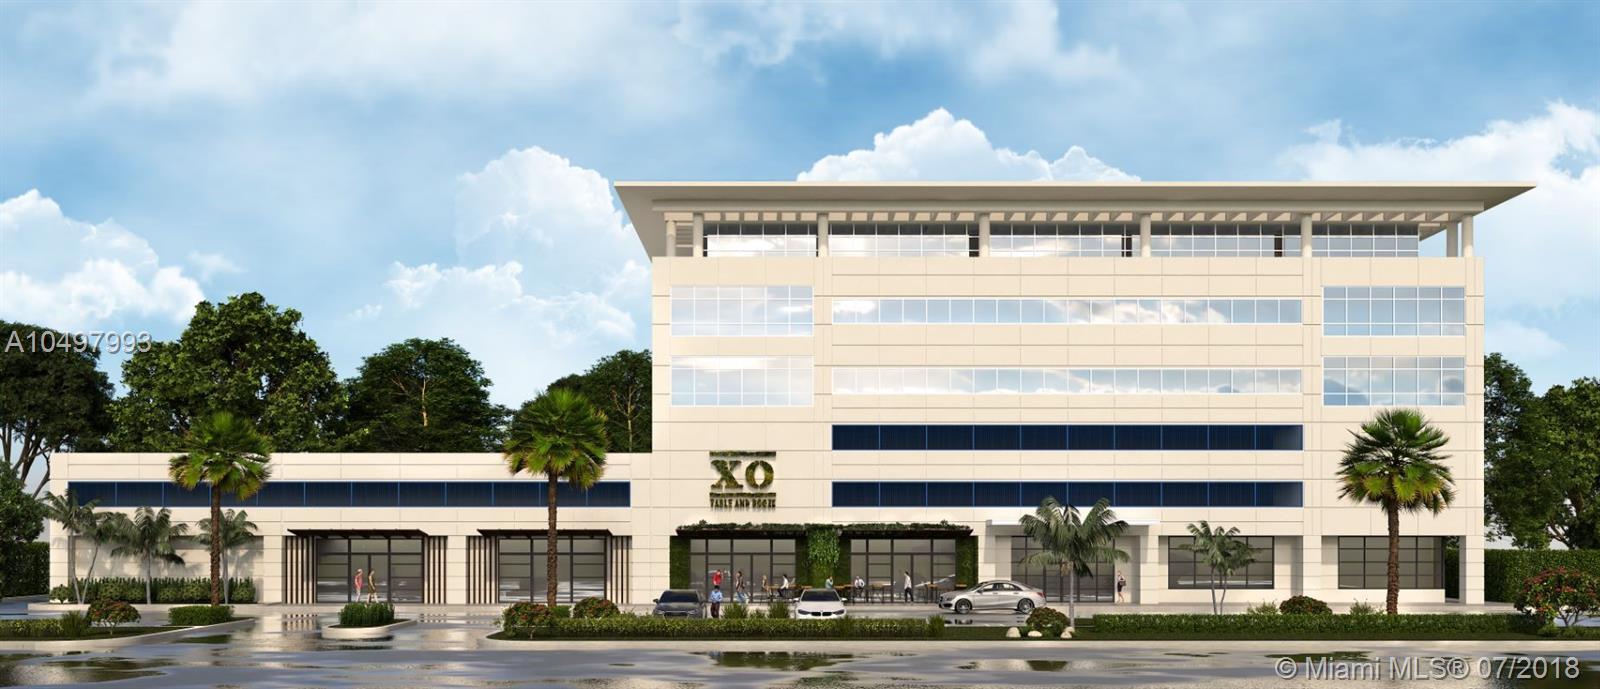 3105 N W 107th Ave #Westbay For Sale A10497993, FL